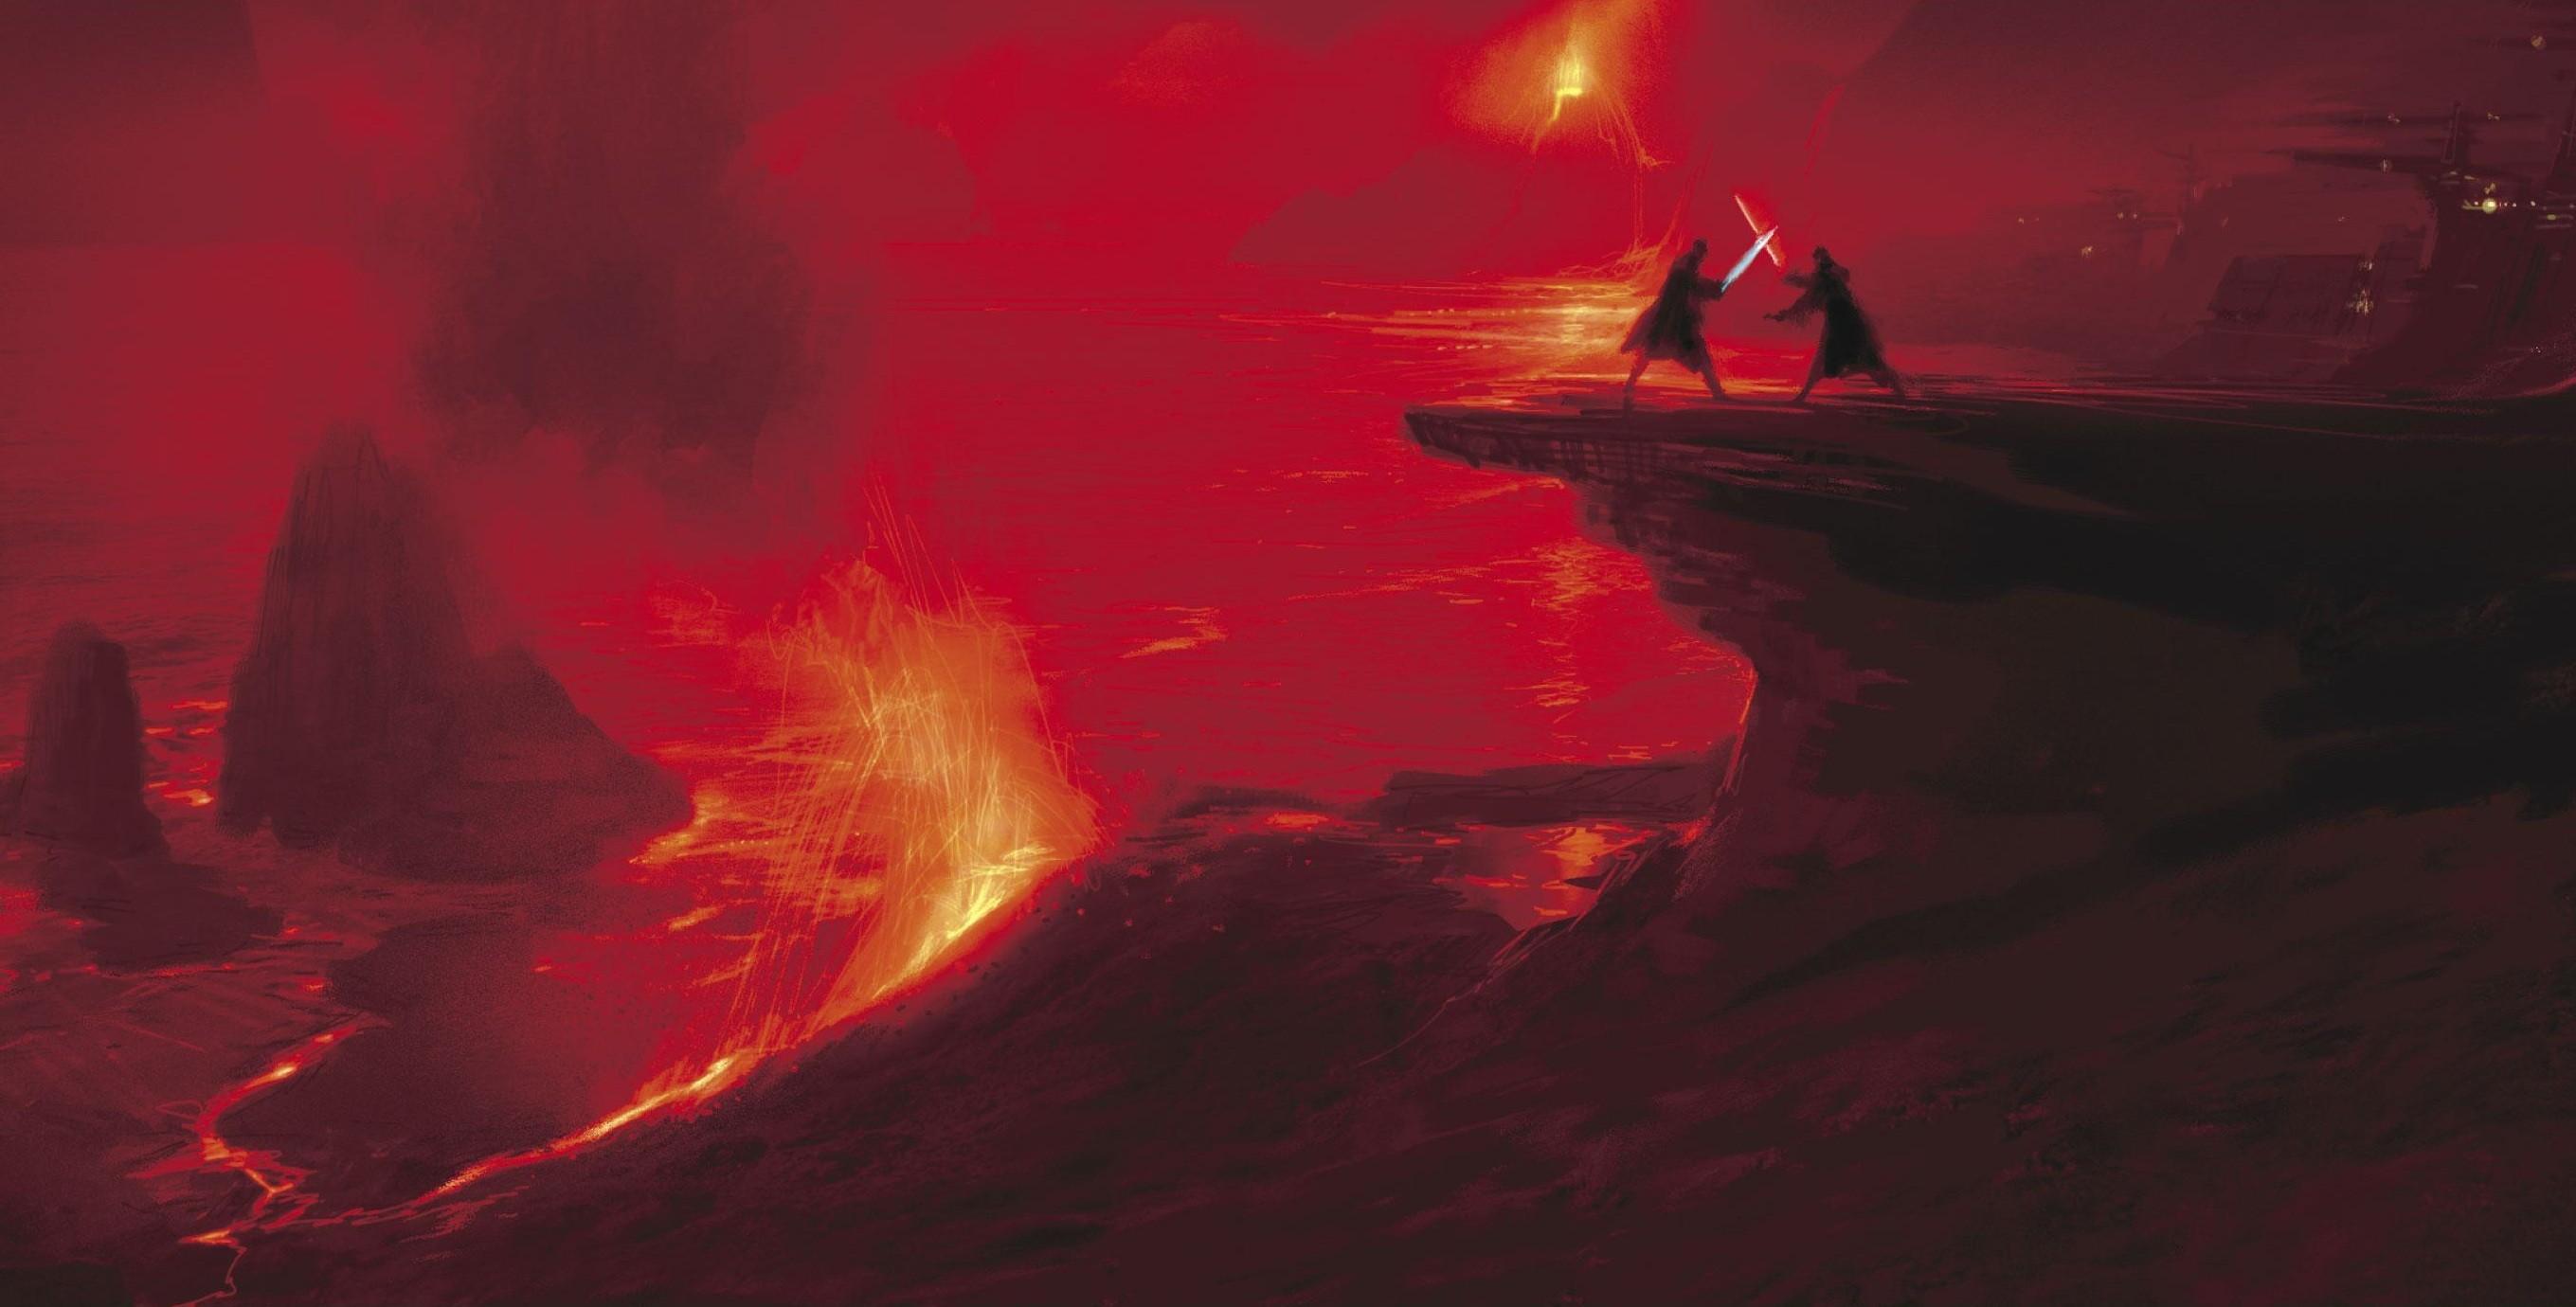 Wallpaper Star Wars Red Artwork Science Fiction Concept Art Volcano Lightsaber Jedi Darth Vader Lava Star Wars Episode Iii The Revenge Of The Sith Mustafar Screenshot Geological Phenomenon 2719x1380 Missunify